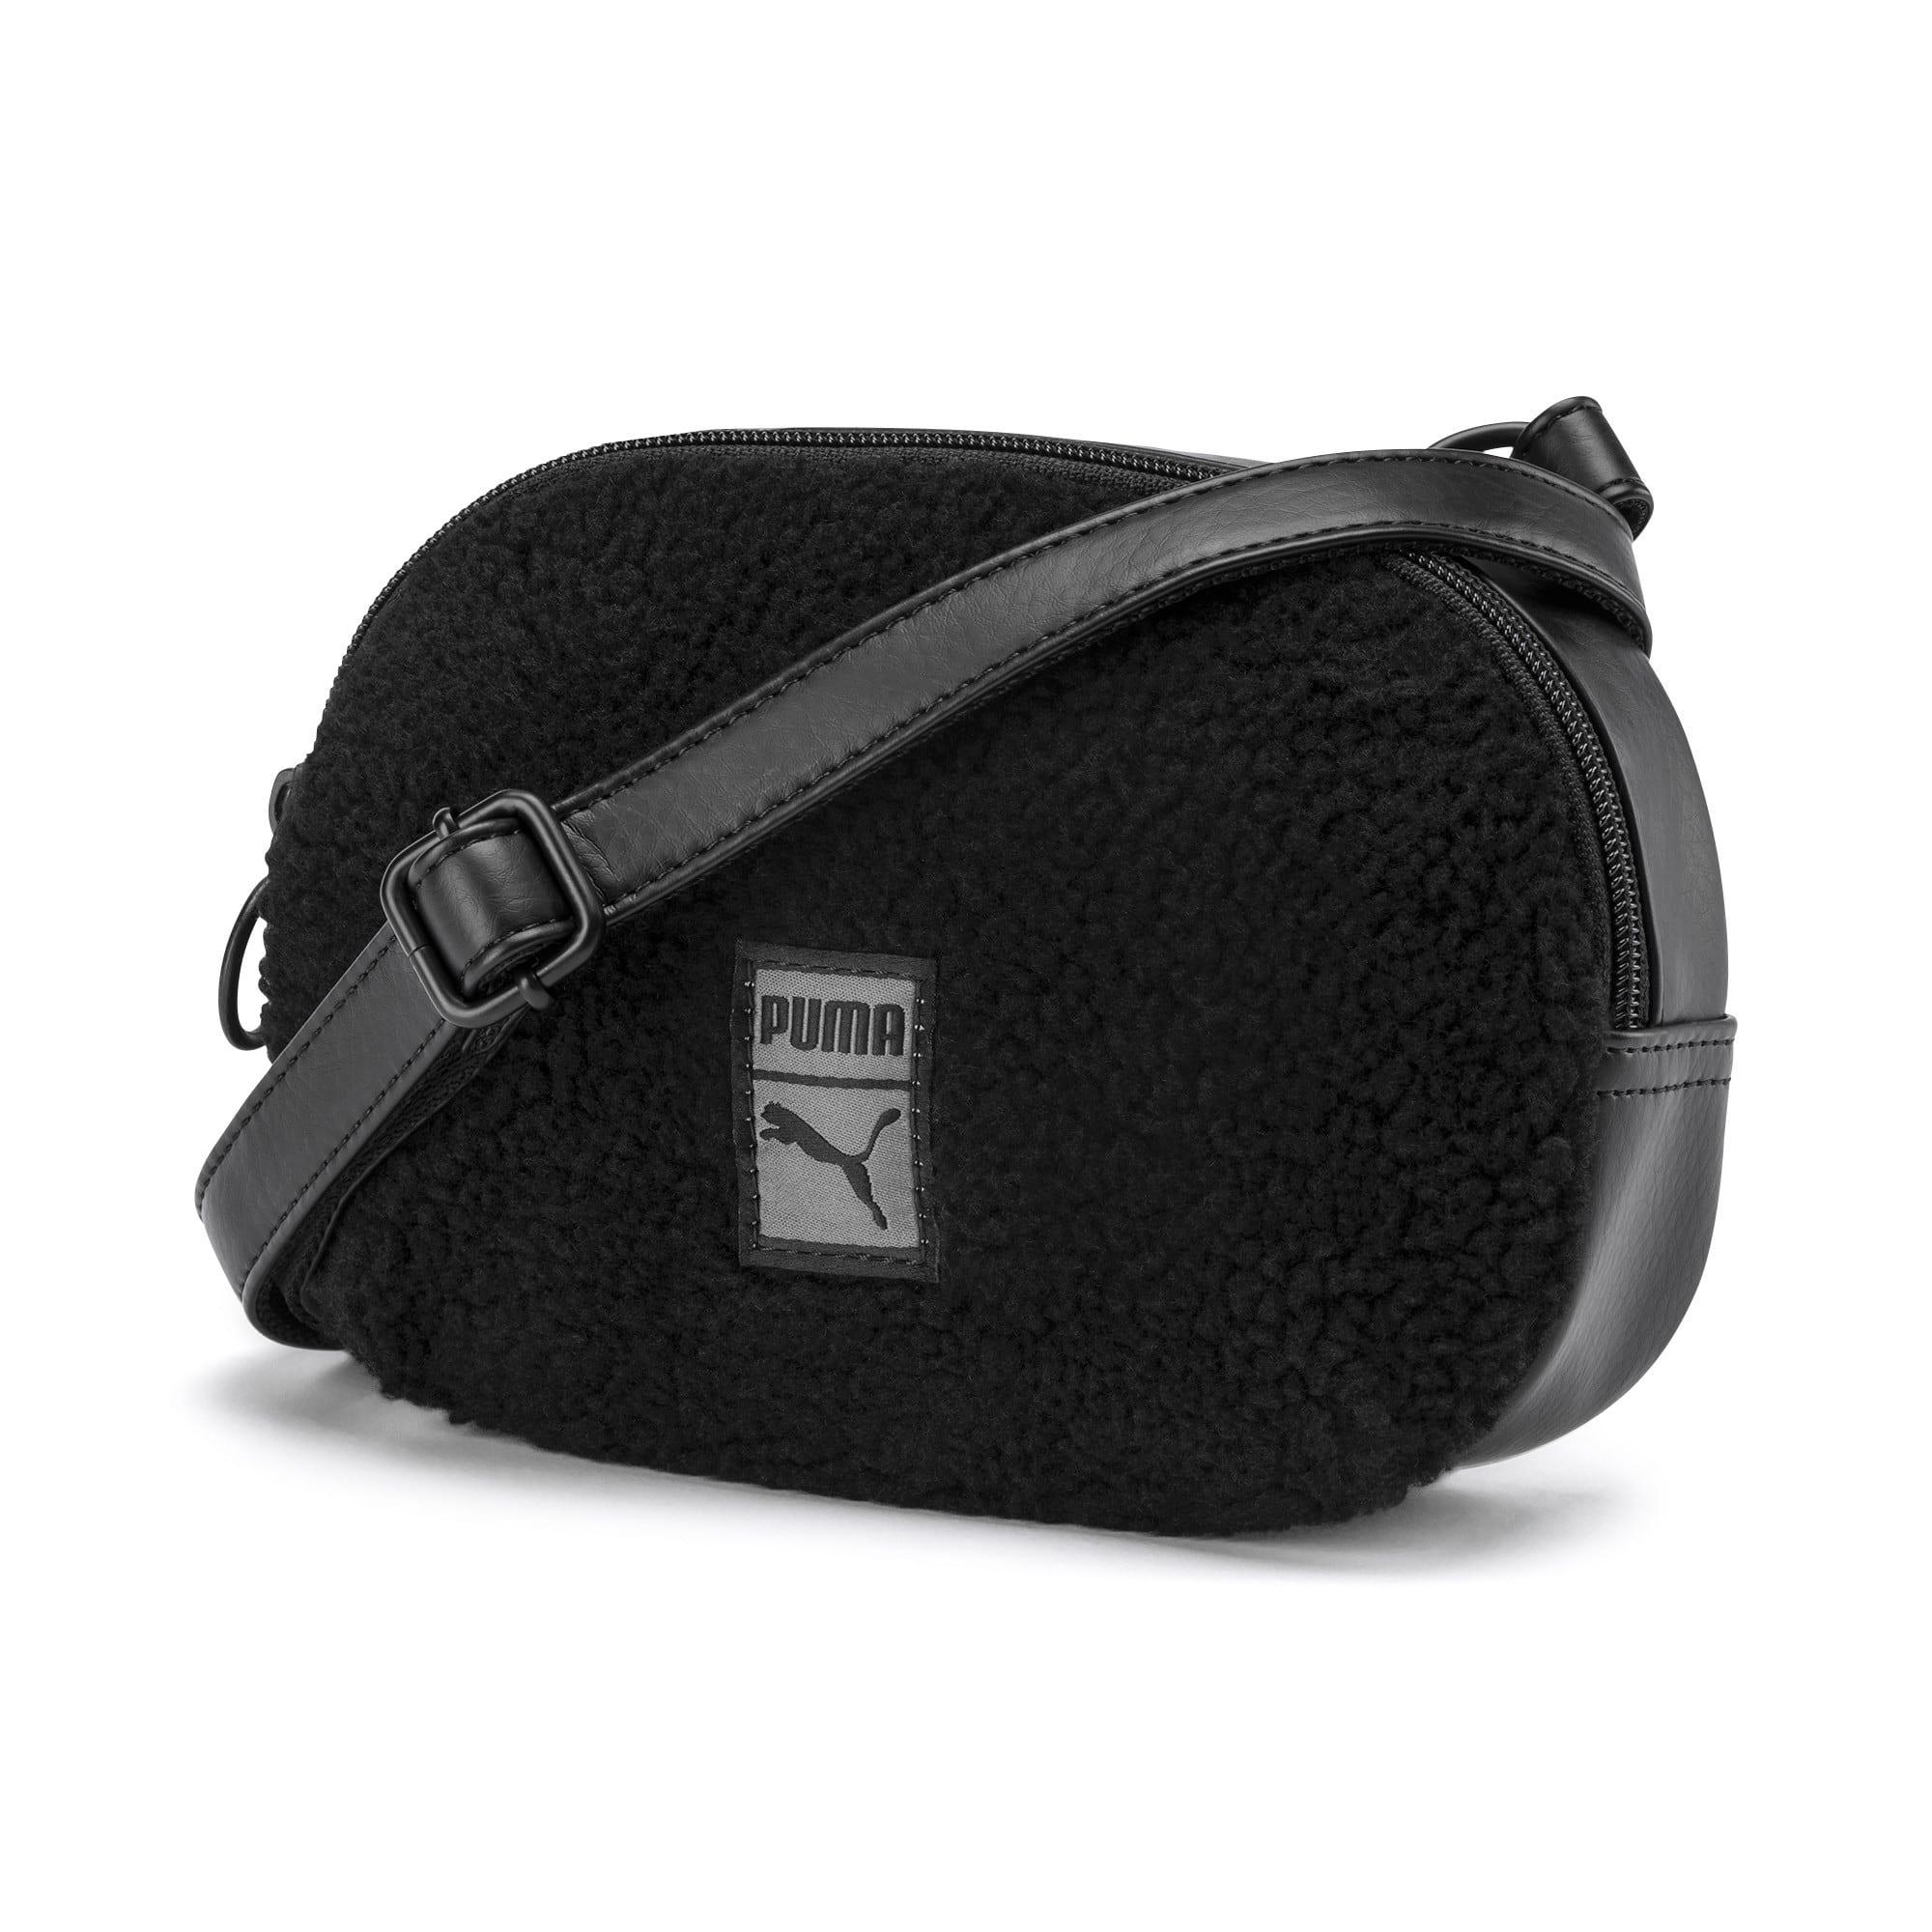 Thumbnail 1 of Prime Time Crossbody Bag, Puma Black-Puma Black, medium